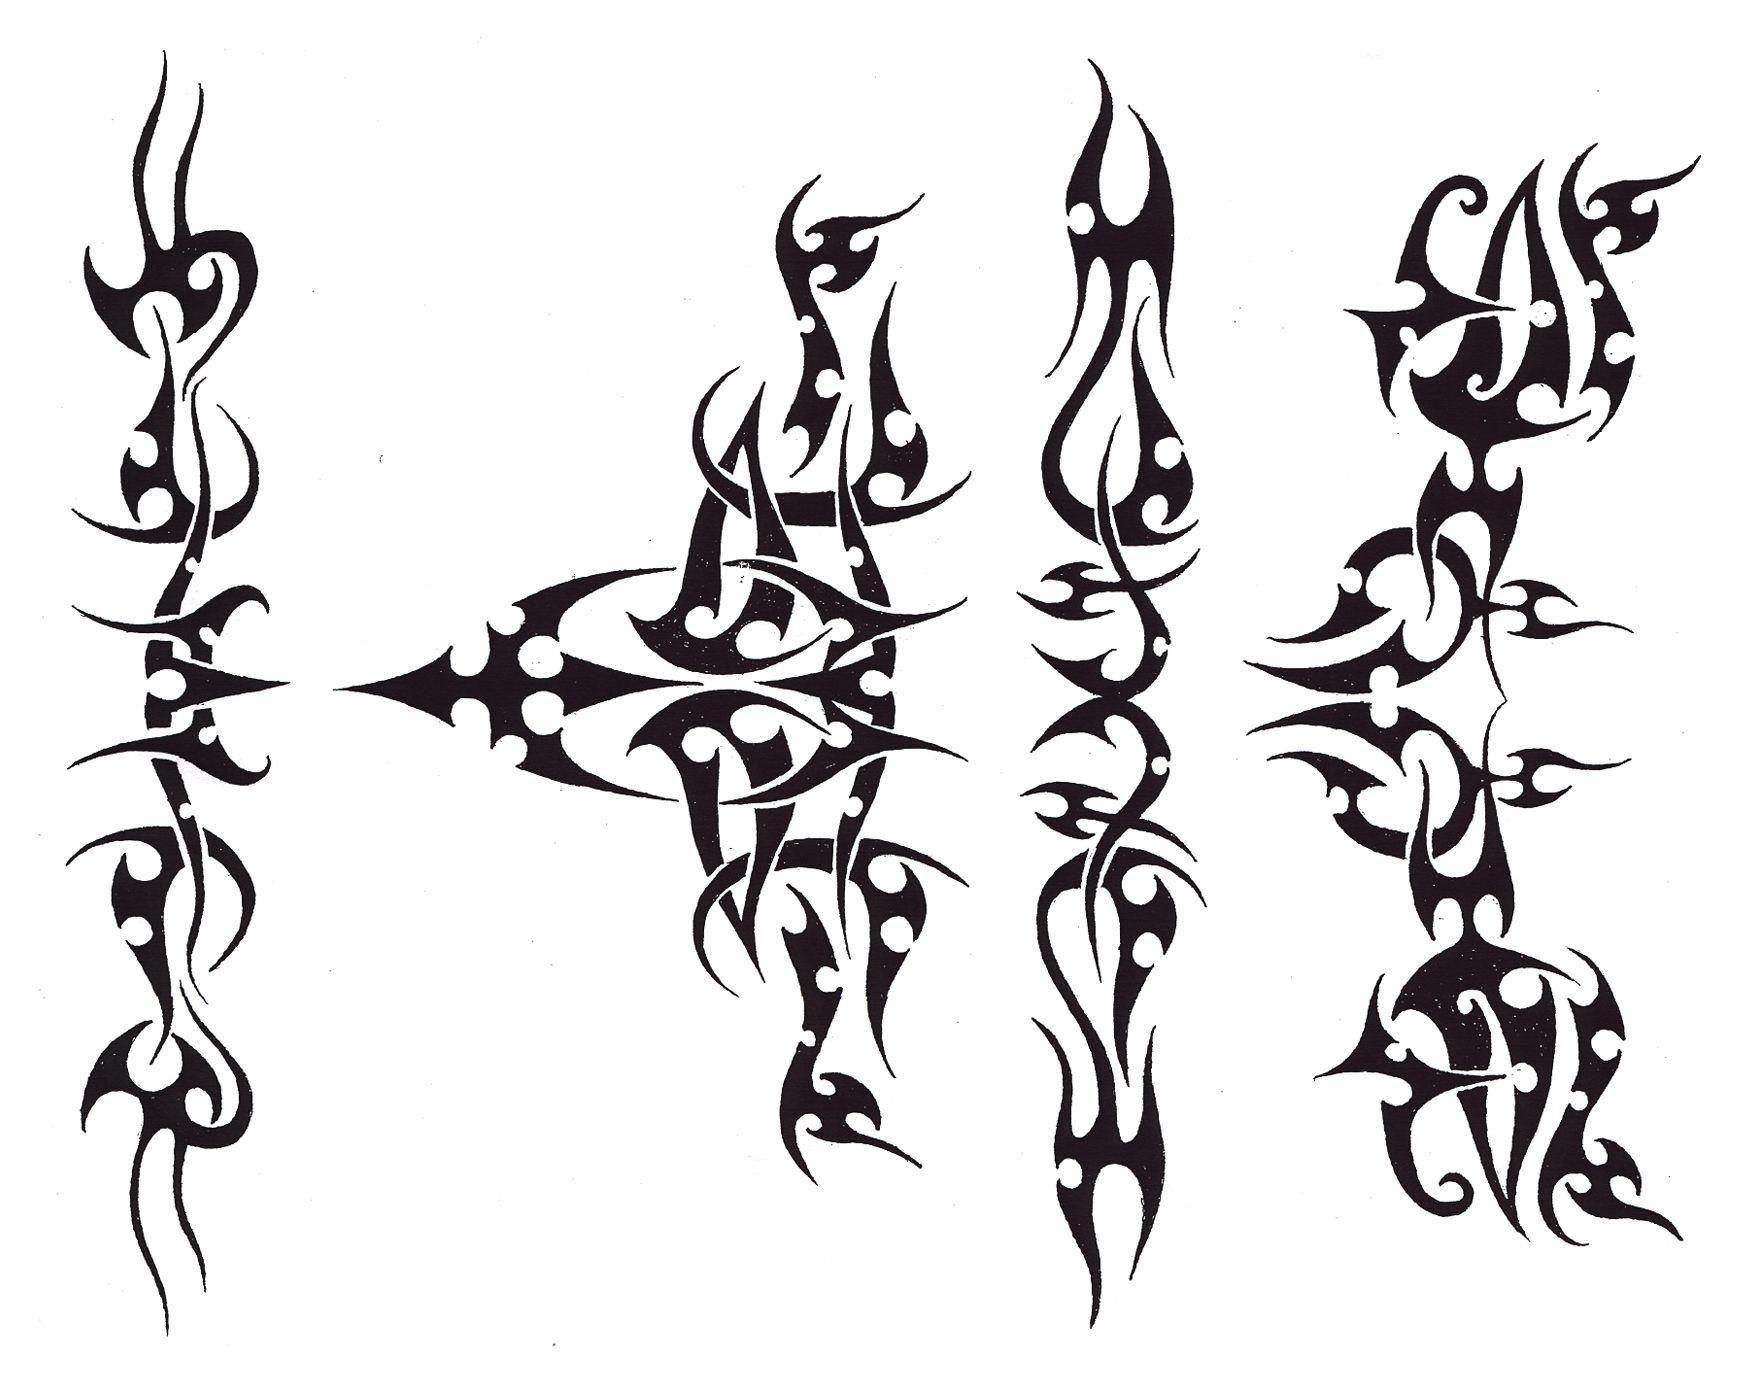 Tribal Armband Tattoos